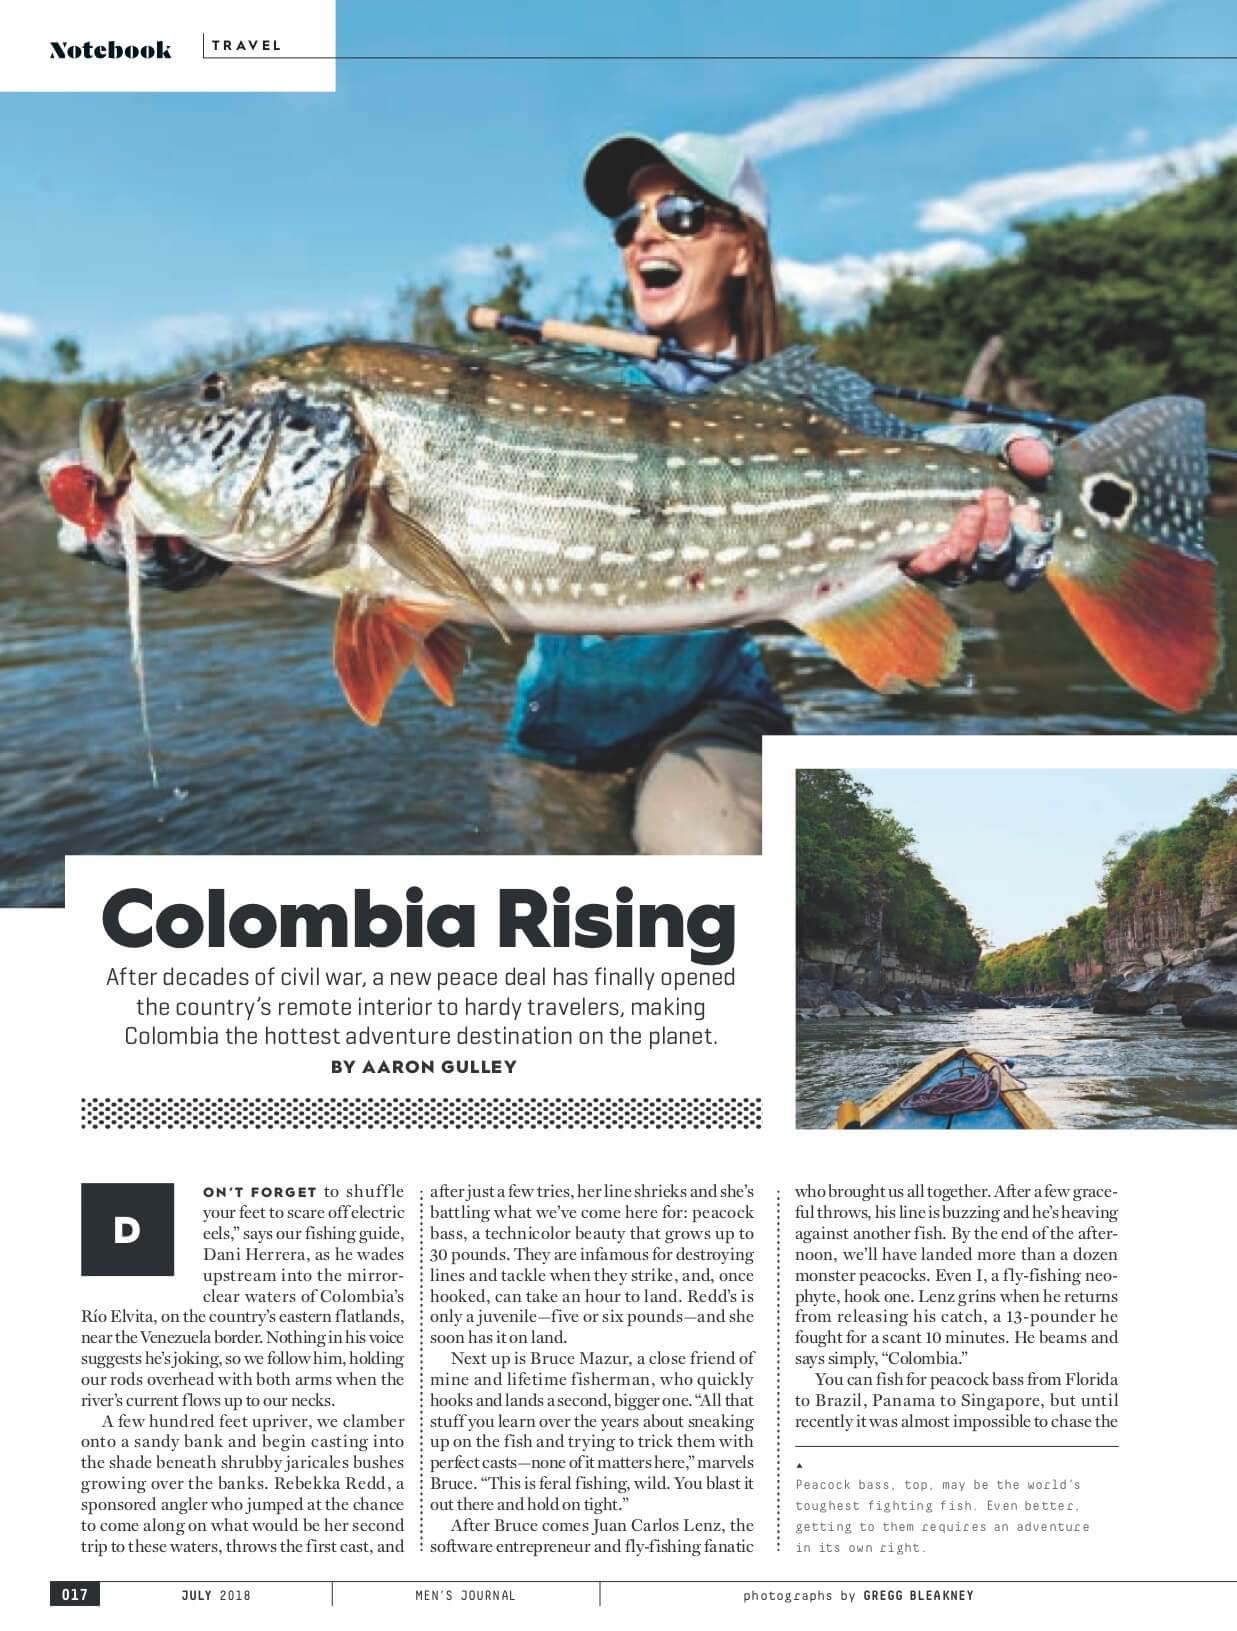 Colombia Production Services Men's Journal